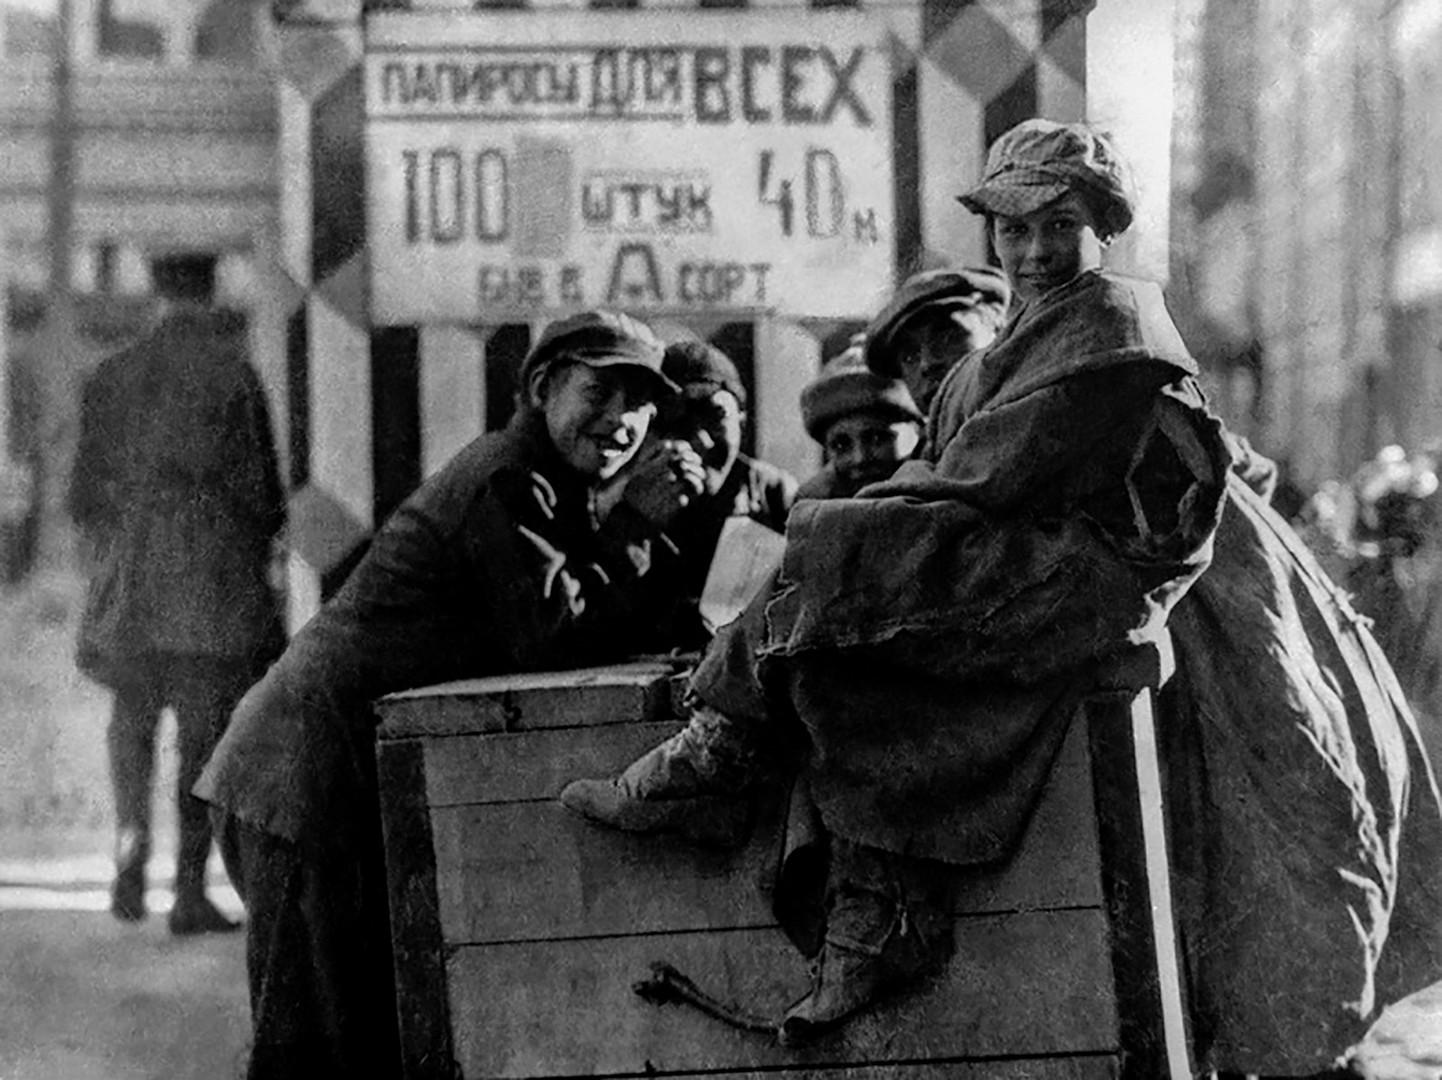 Straßenkinder in Moskau, Starokonjuschennij Pereulok/Arbat, 1920